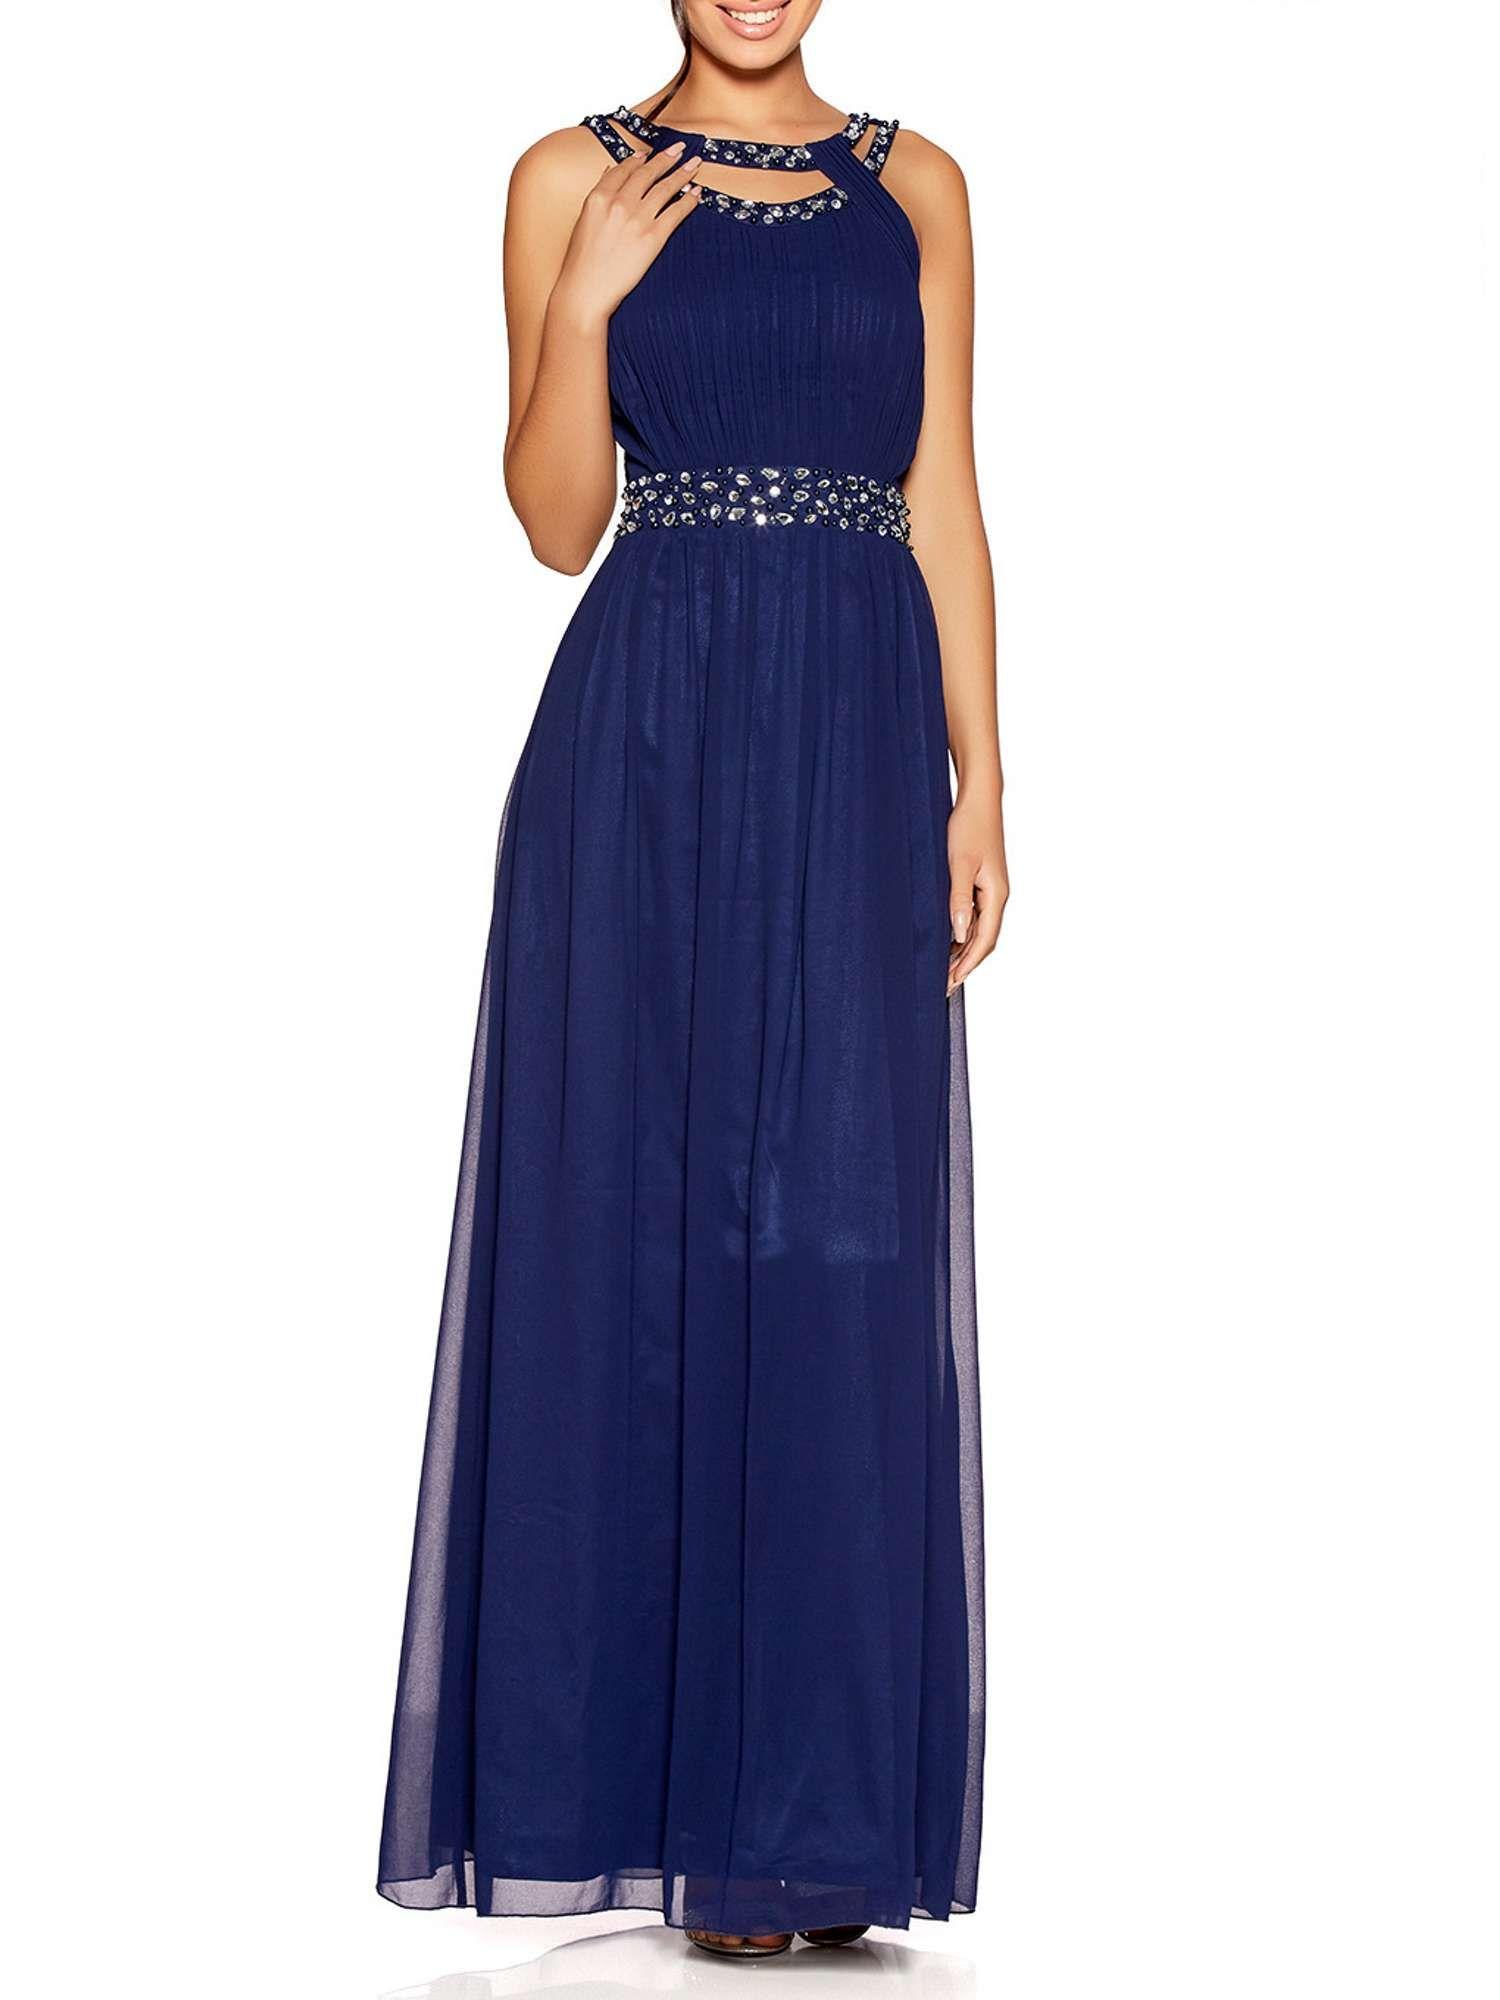 Quiz chiffon embellished maxi dress maxi dresses dress online and